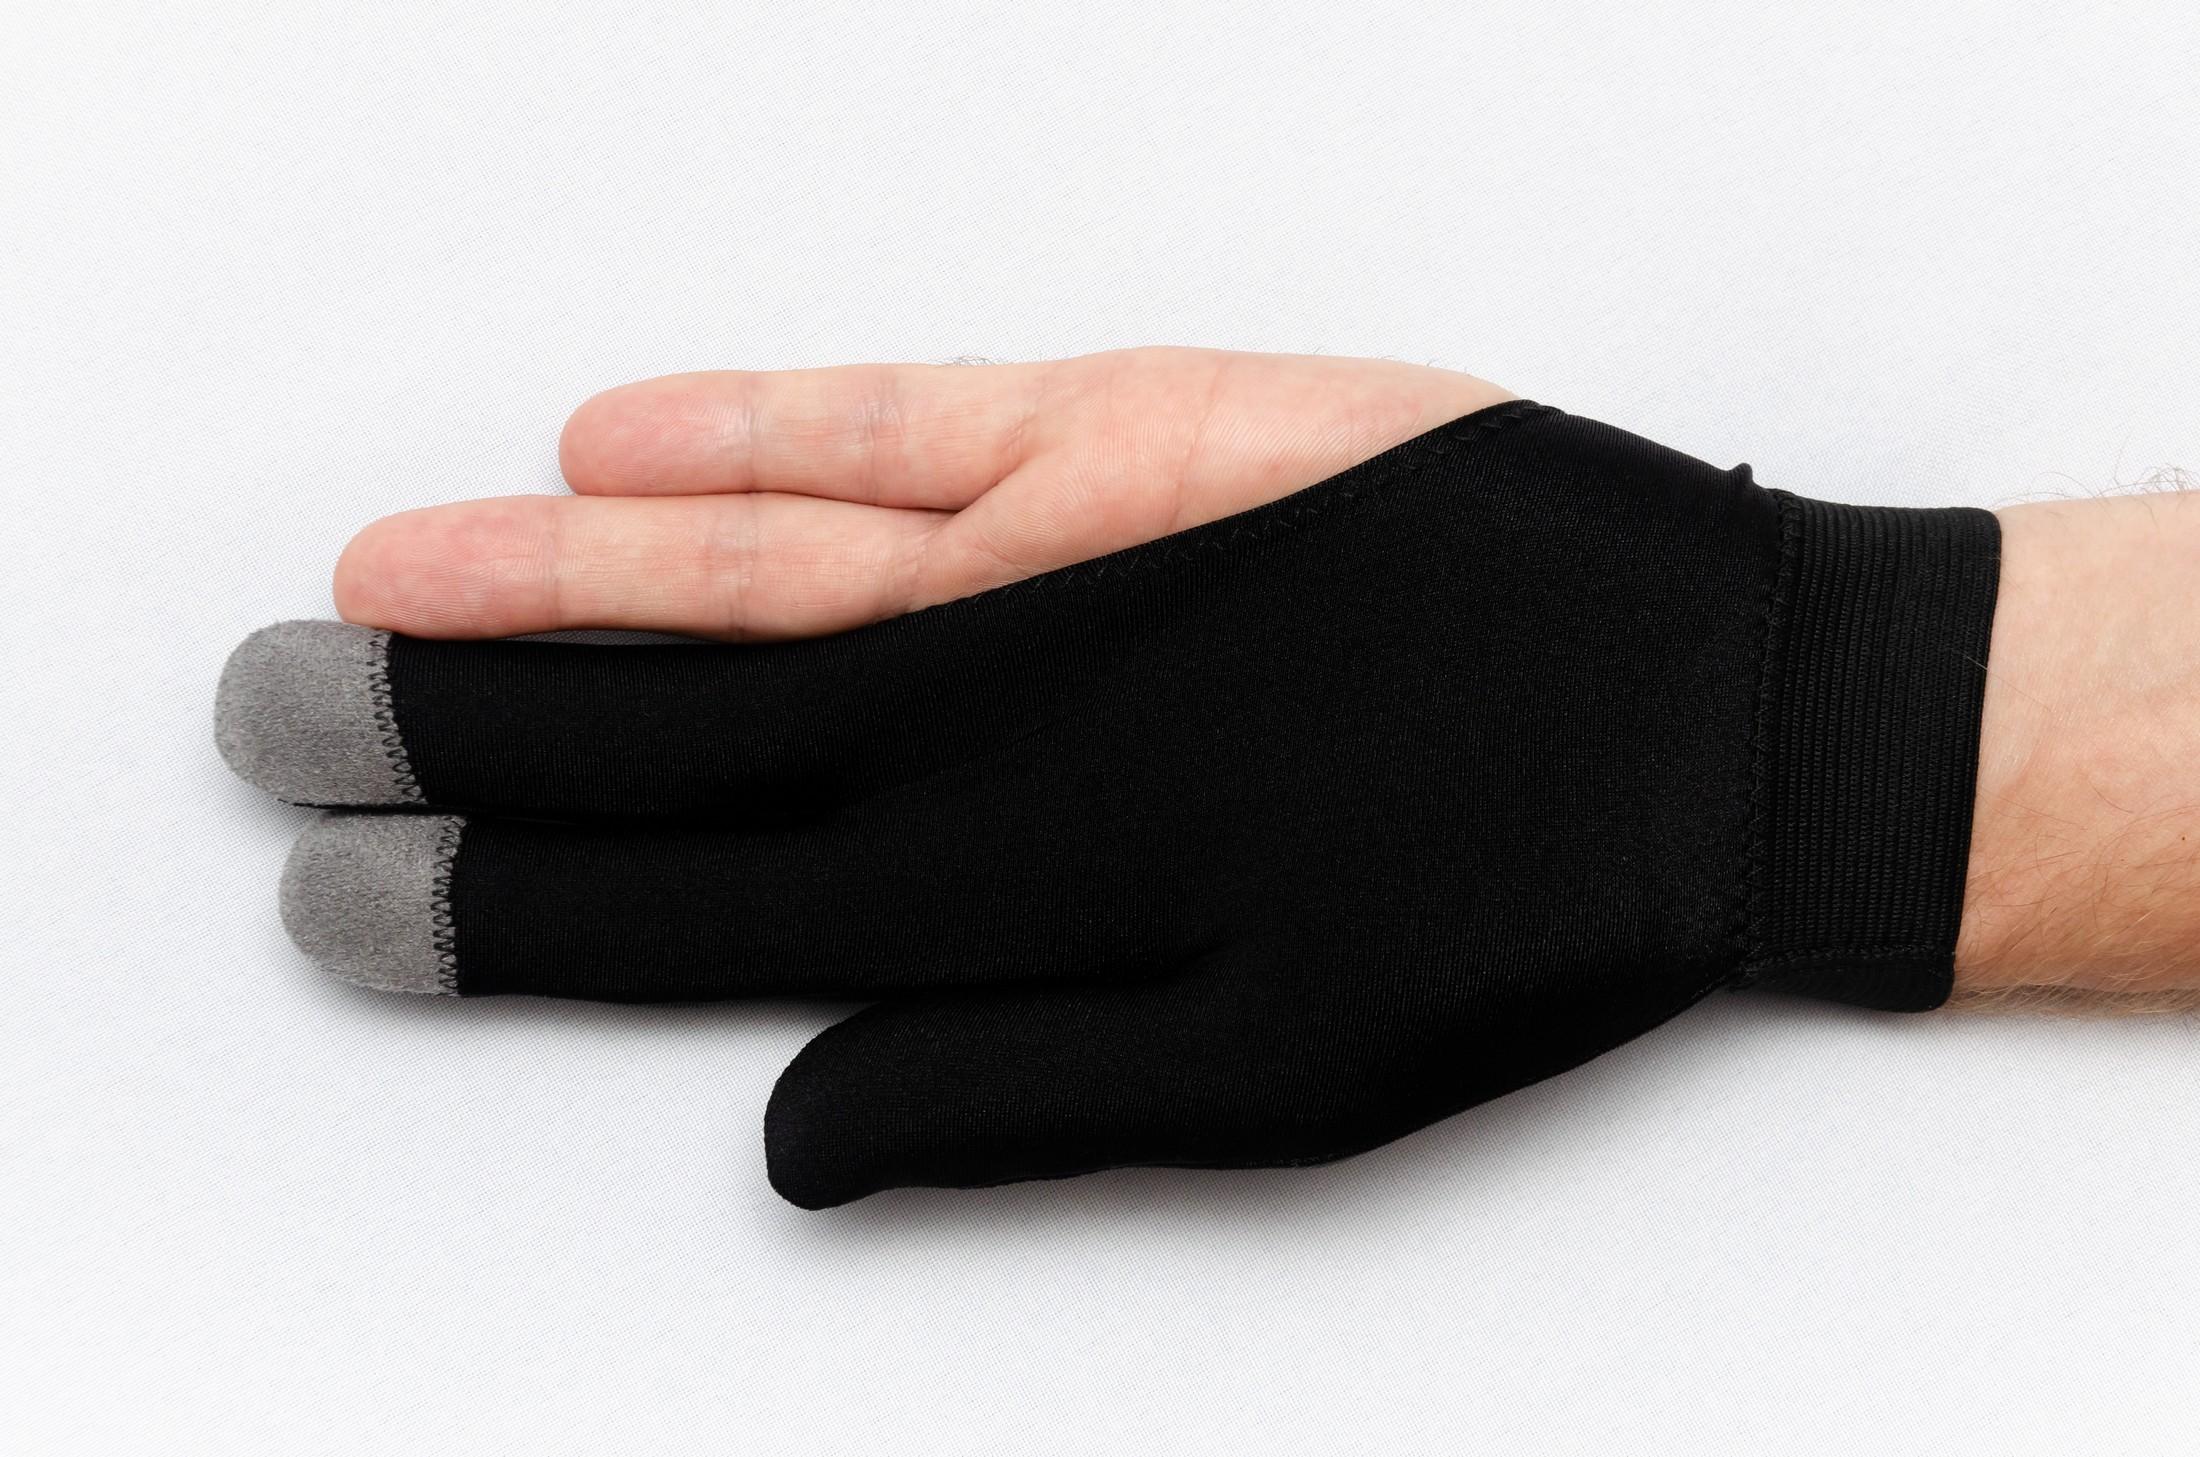 Перчатка Skiba Premium вставки замши черная M/L